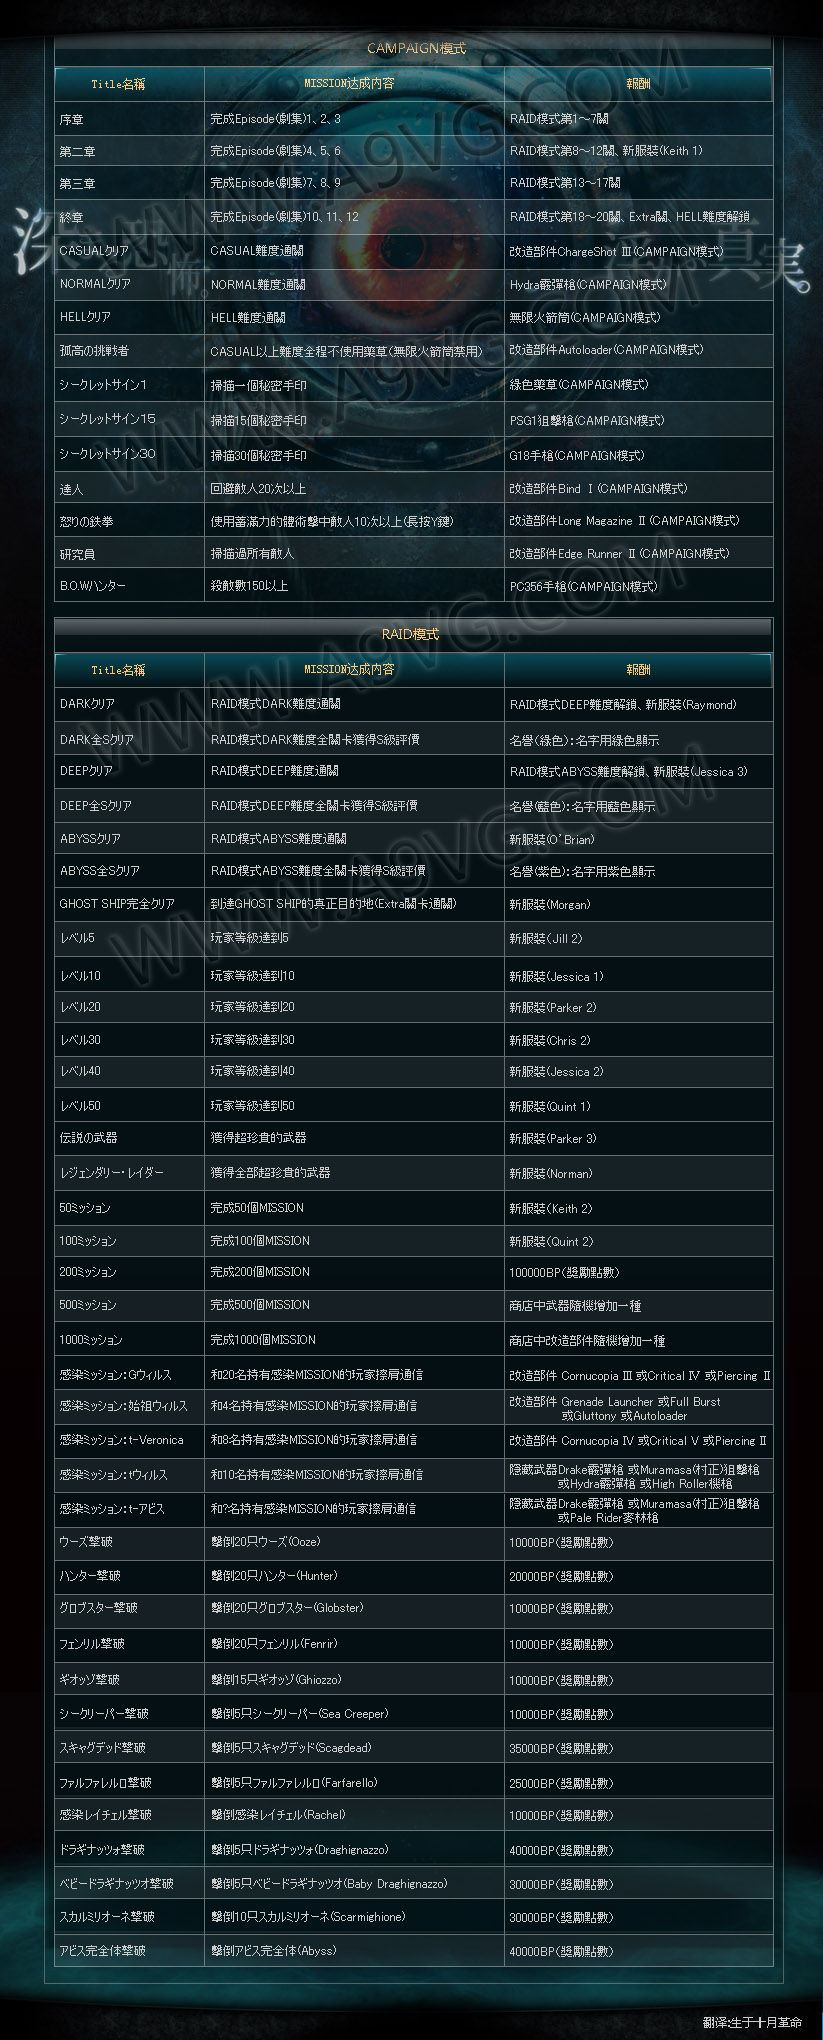 【3DS】《生化危机 启示录》任务(MISSIONS)勋章标题、达成条件以及报酬一览